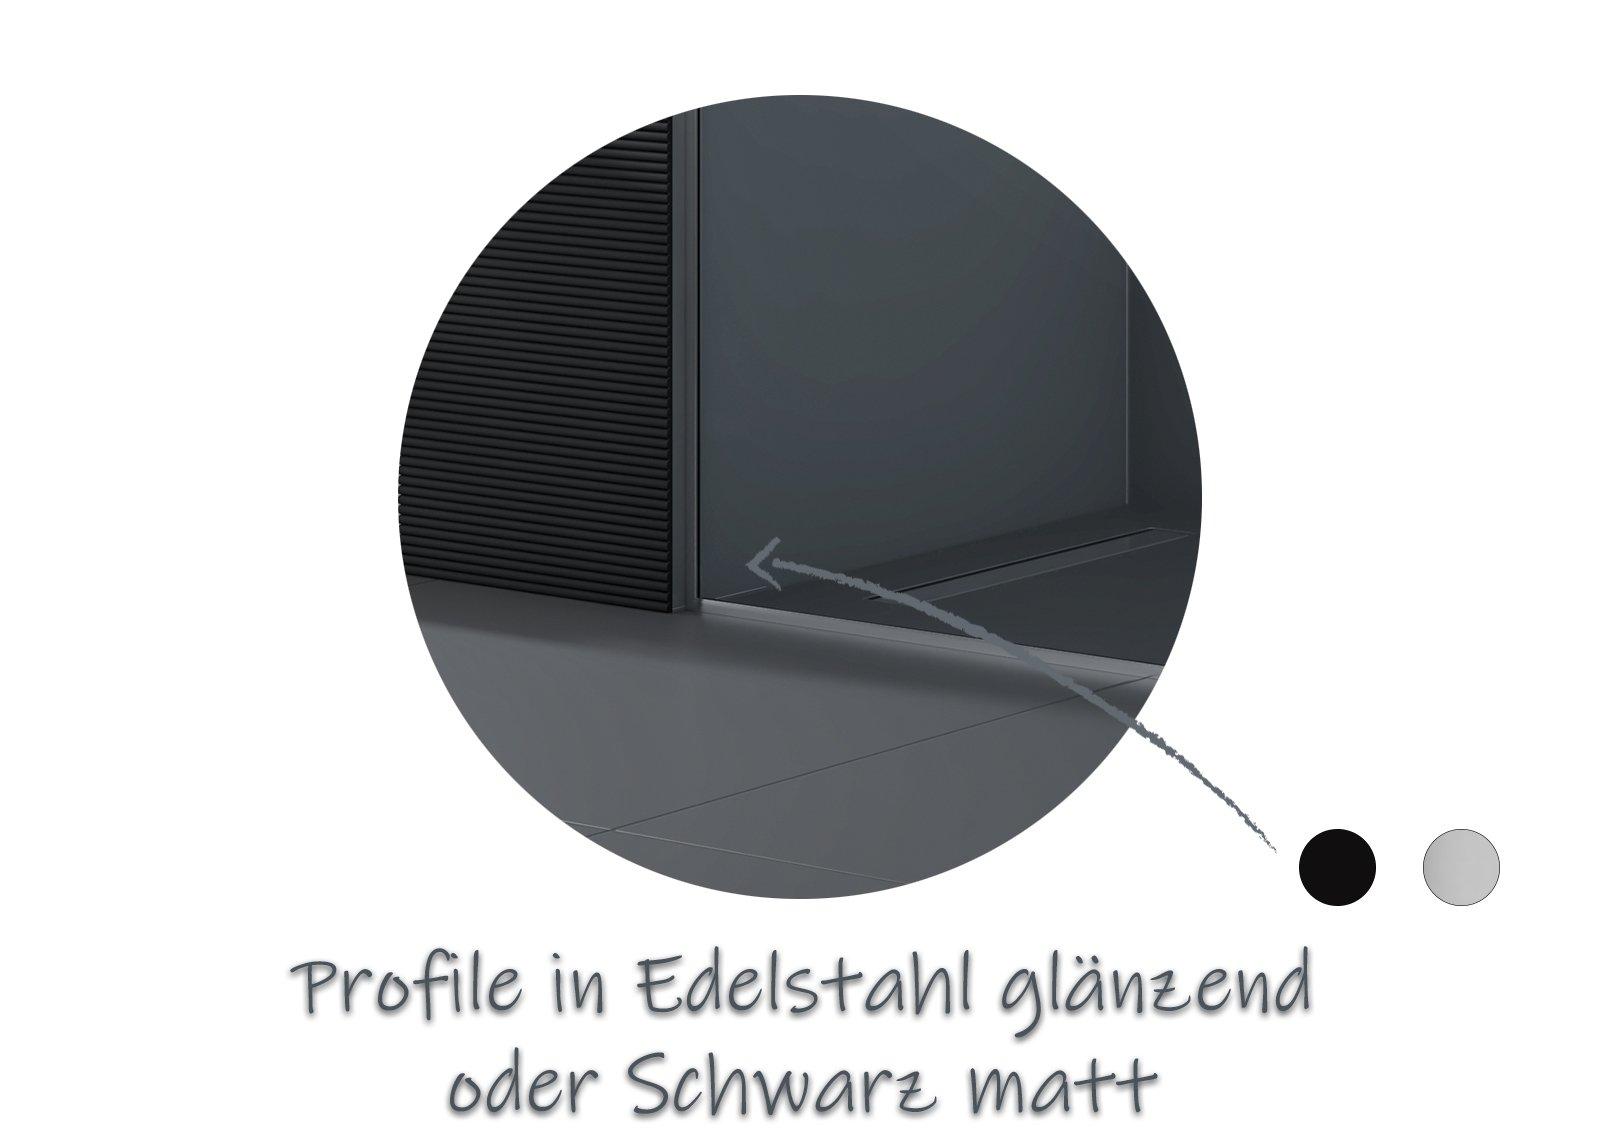 Walk-In 10mm Nano Echtglas EX102 - Klarglas - 1 Glaswand & 14mm Edelstahlprofil - Profilfarbe & Breite wählbar zoom thumbnail 5